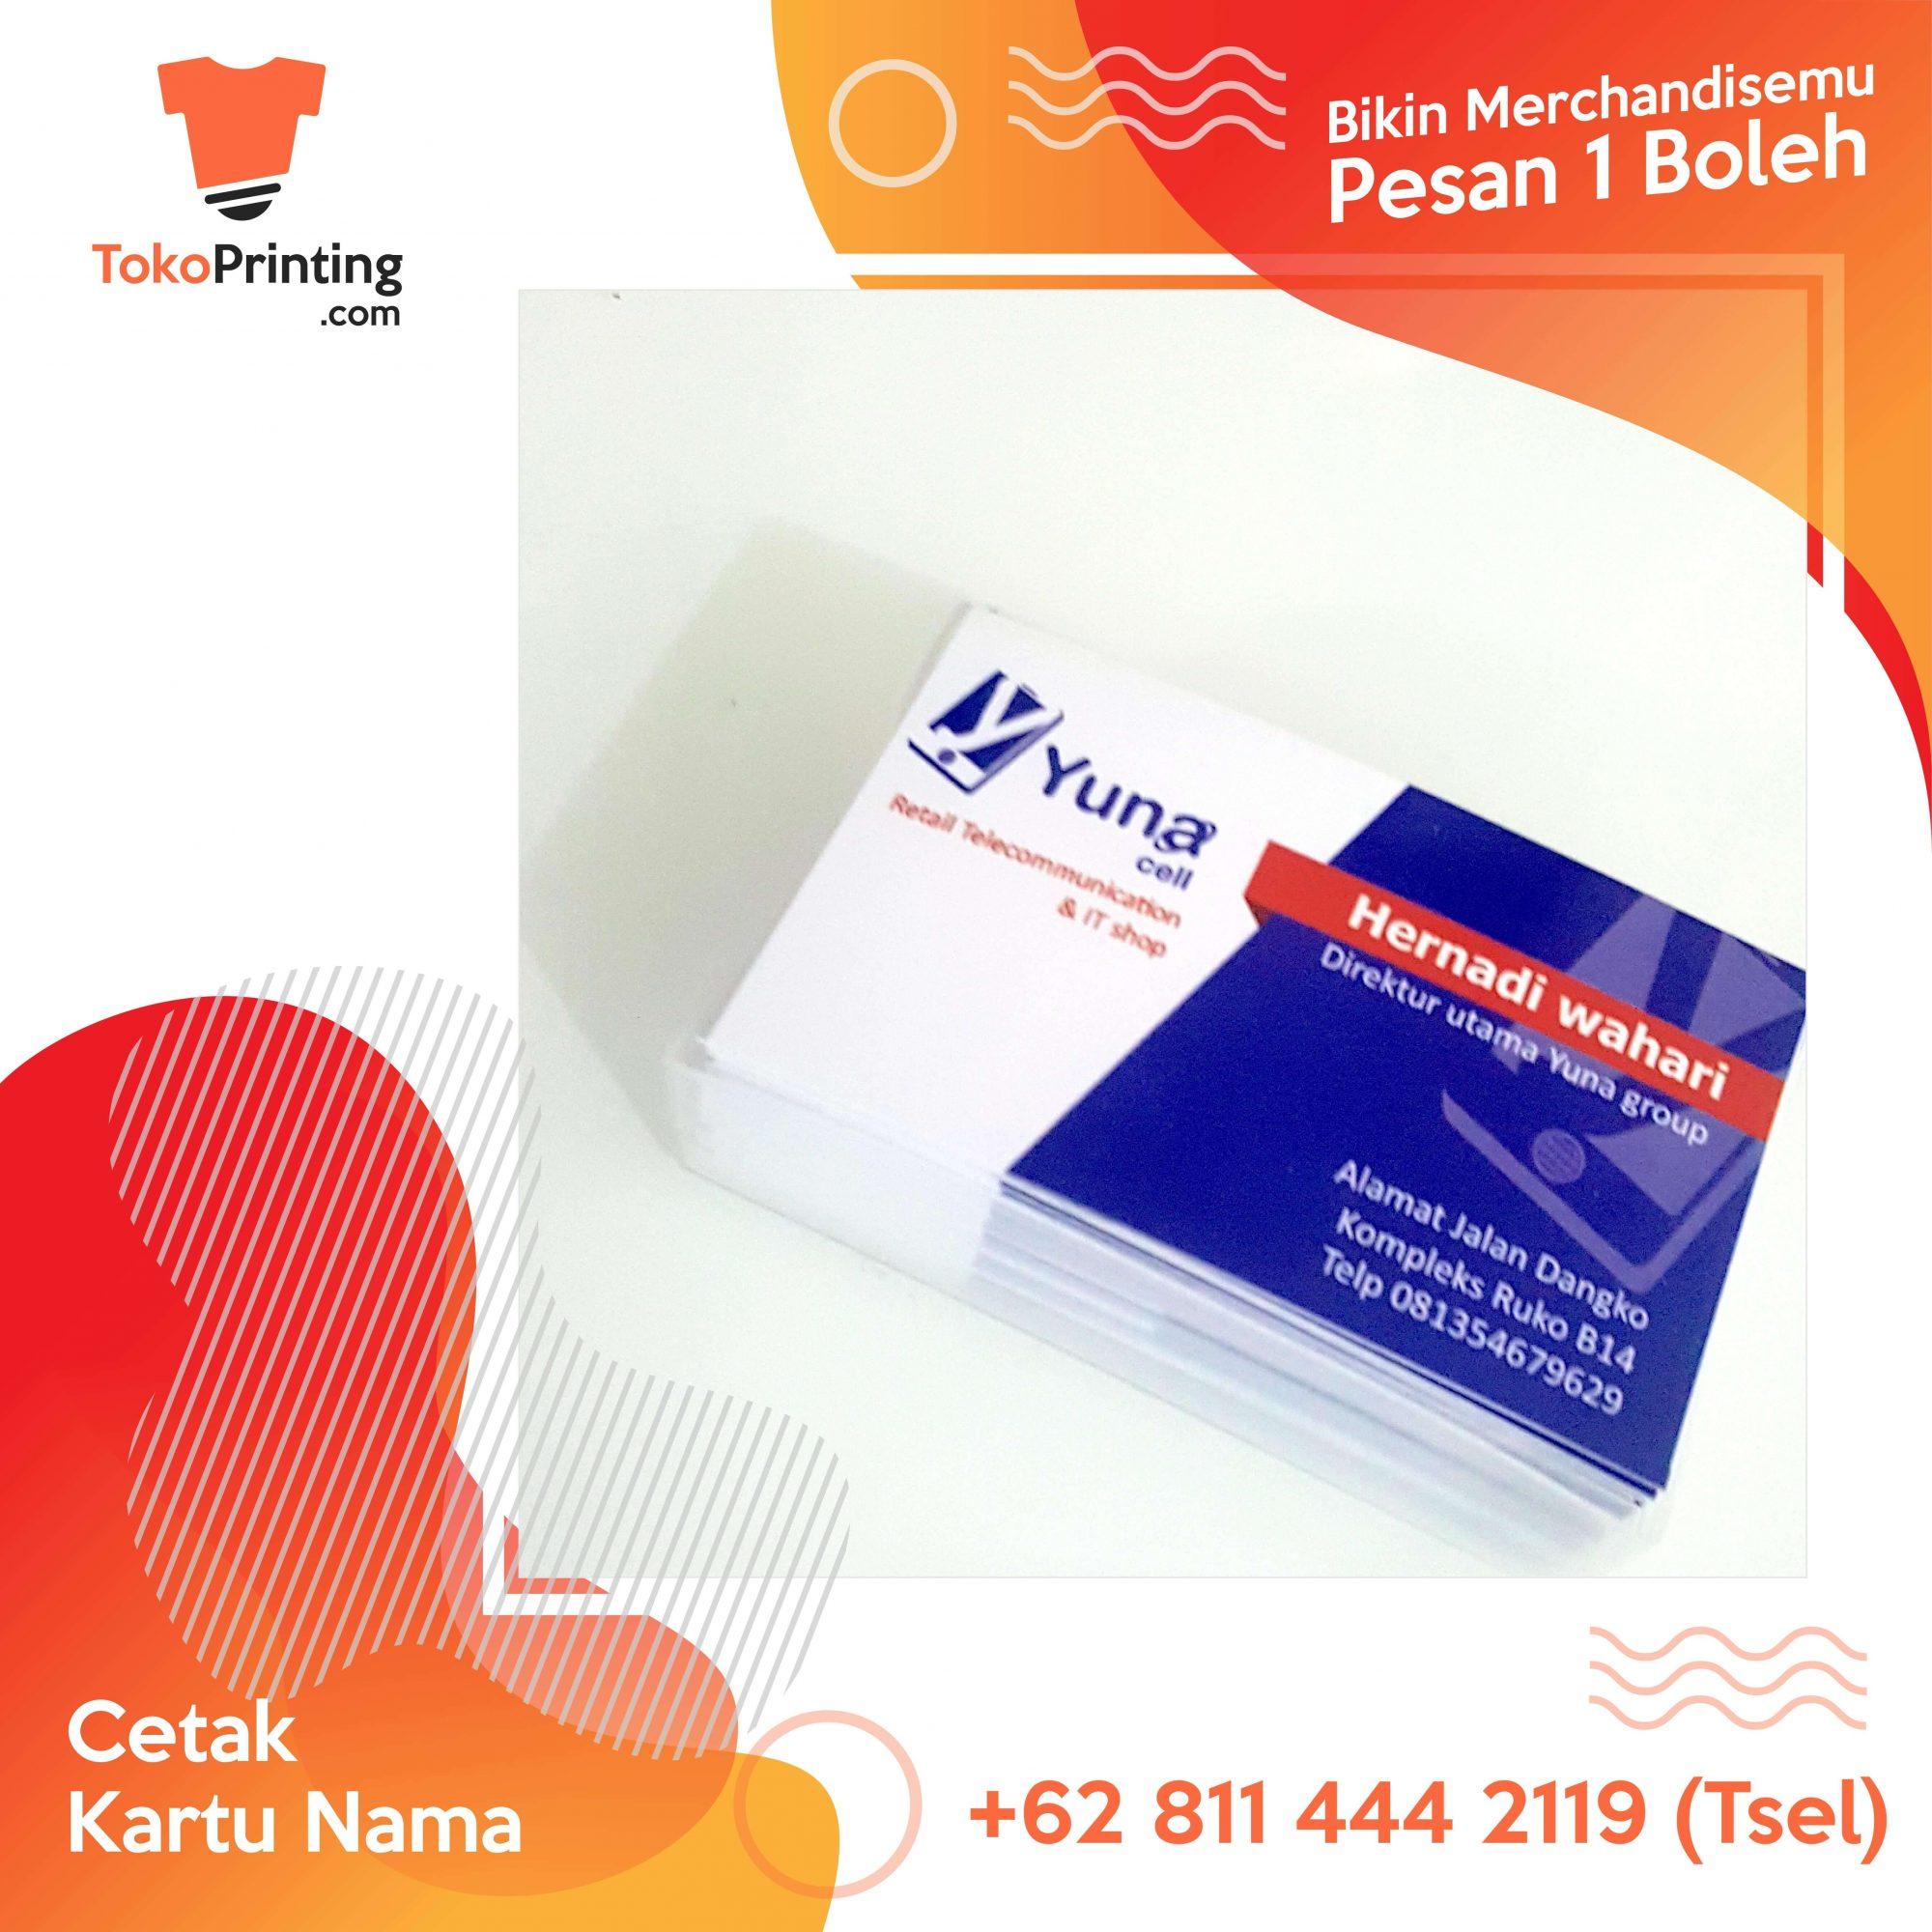 Kartu Nama Makassar